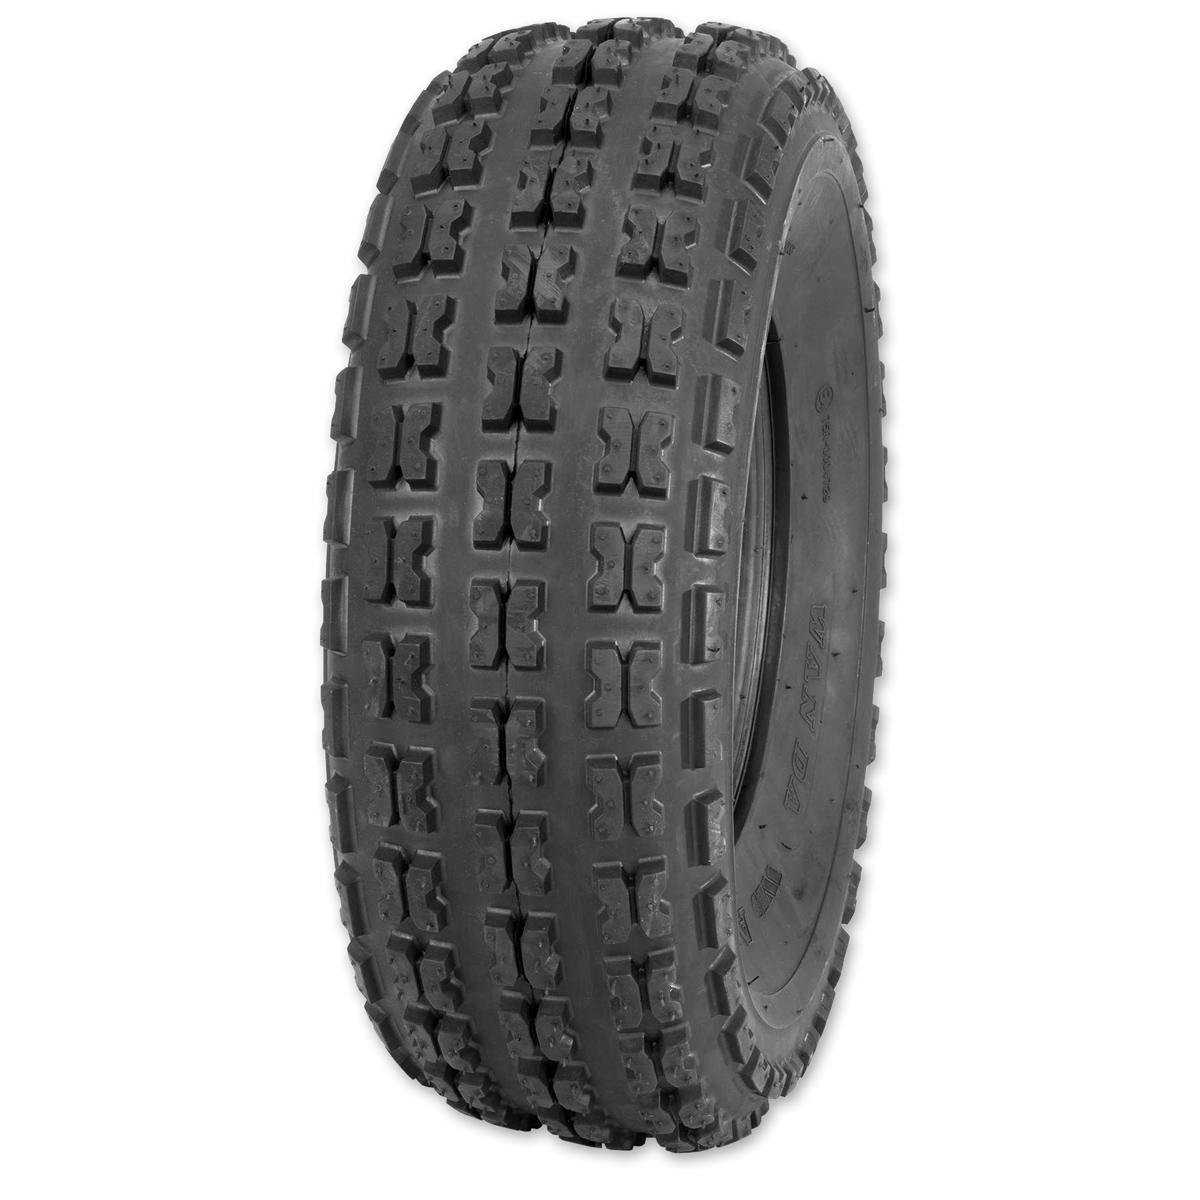 Quadboss QBT733 18X9.5-8 4-Ply Rear Tire